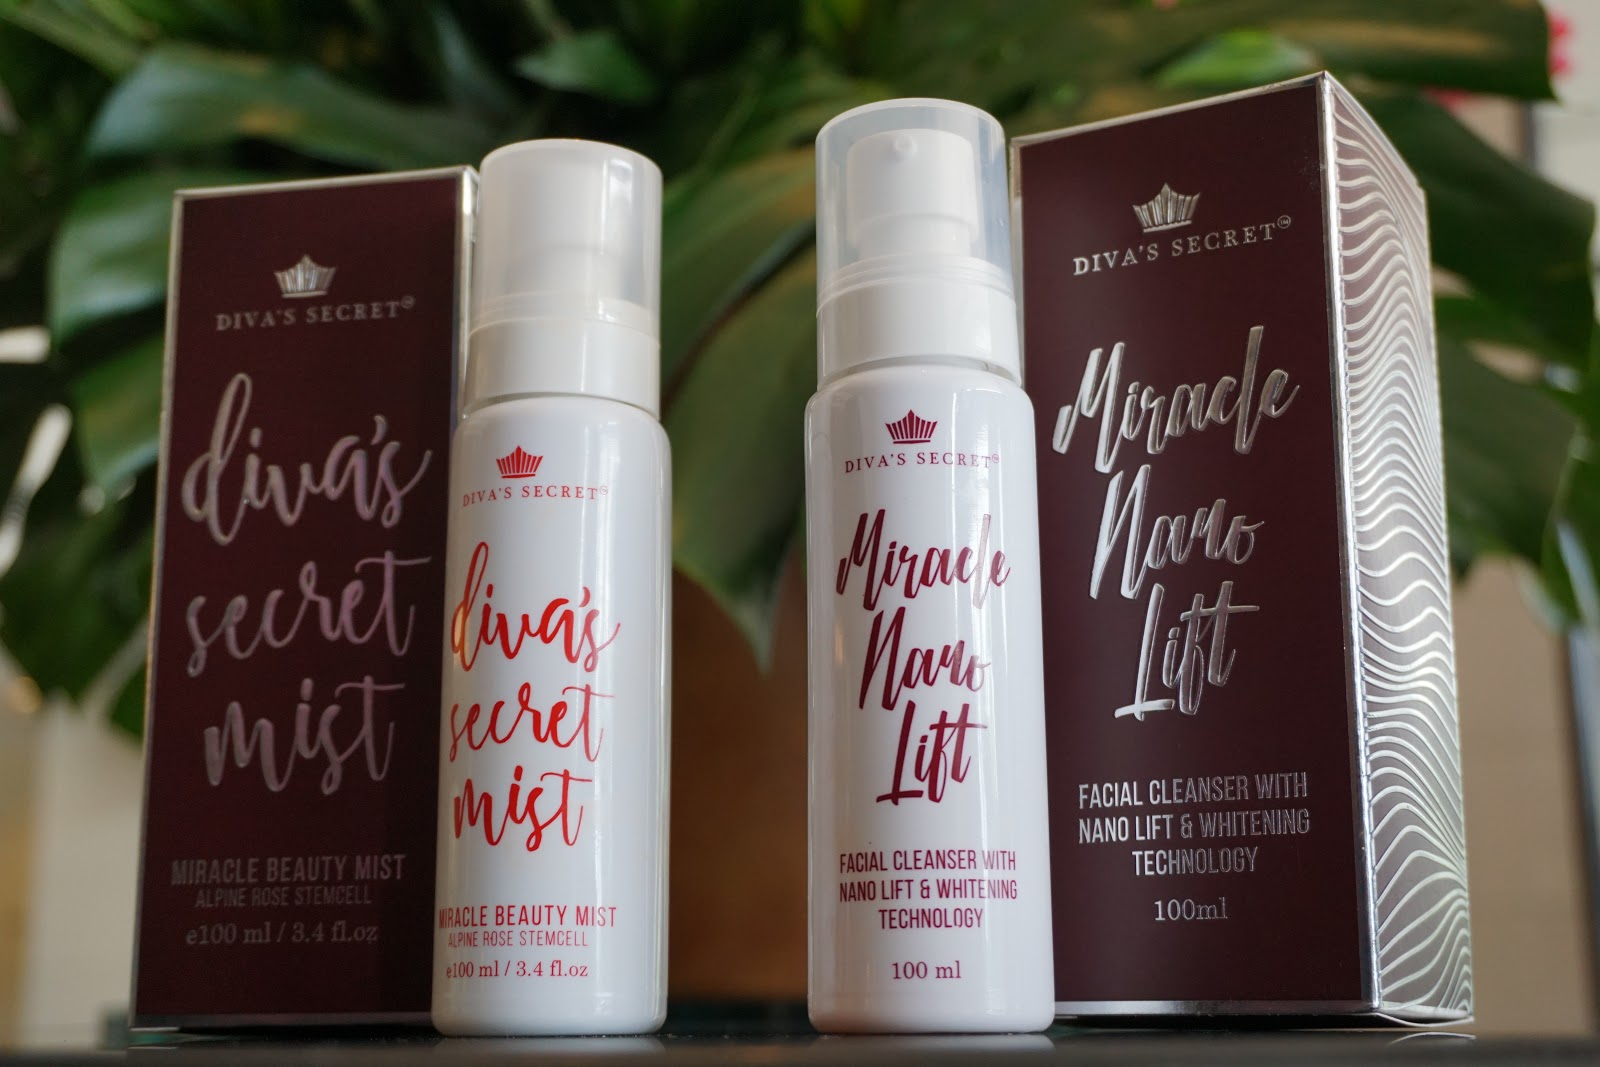 diva's secret ifa raziah produk kecantikan malaysia